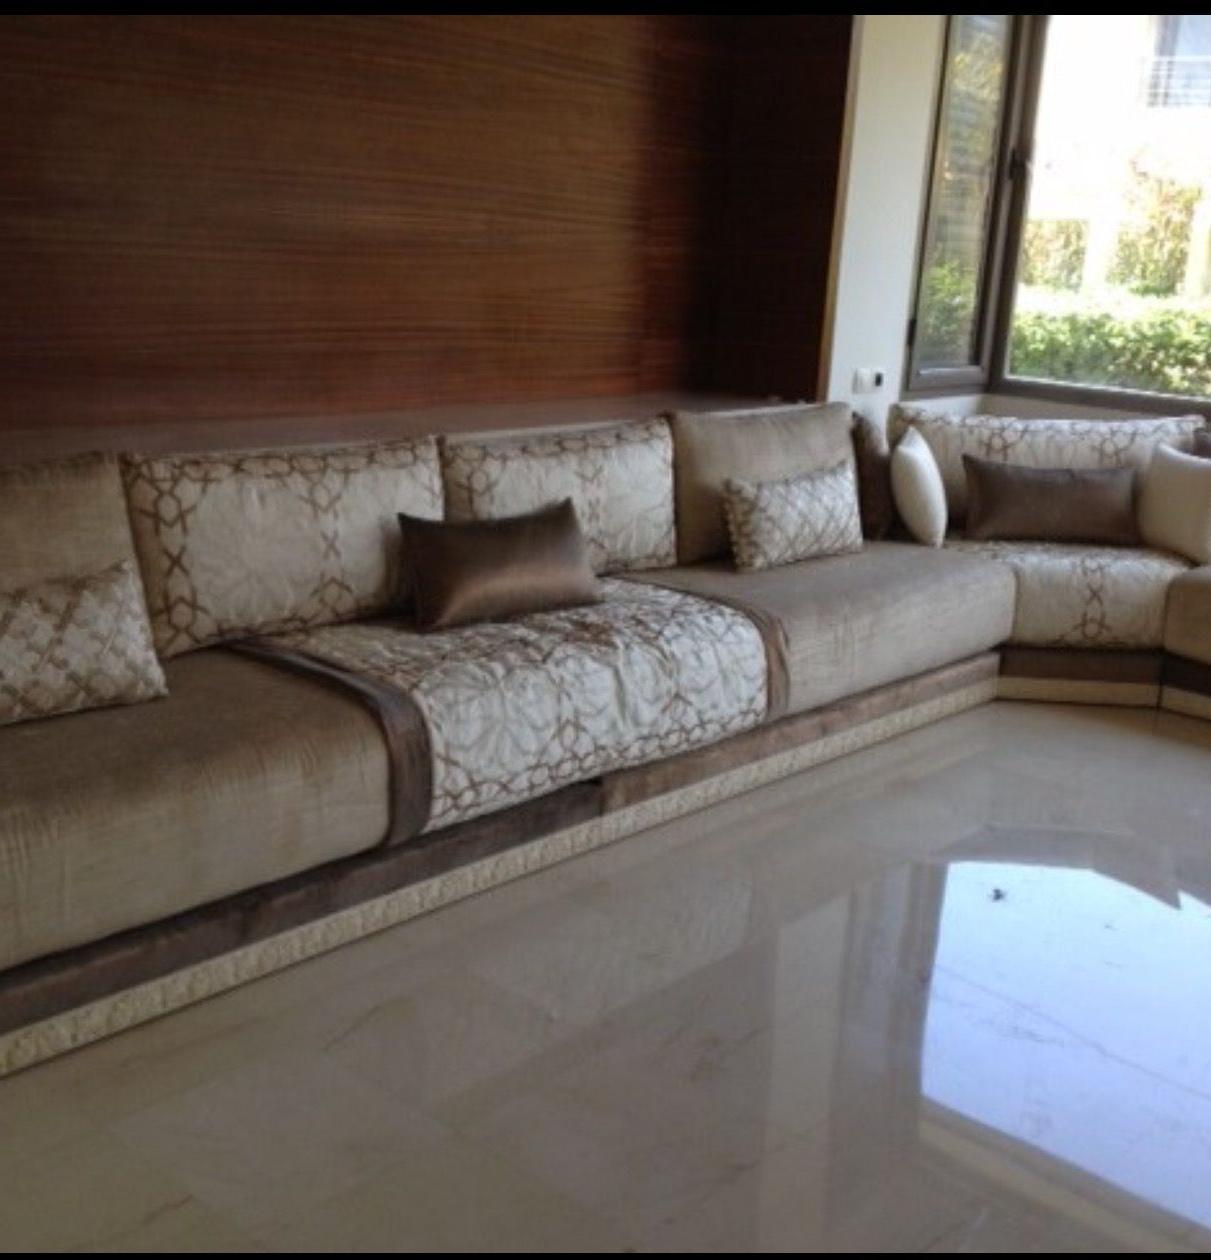 ... Sofas Marroquies Etdg Seddari The Moroccan Sofa Furniture Pinterest Salon  Marocain ...